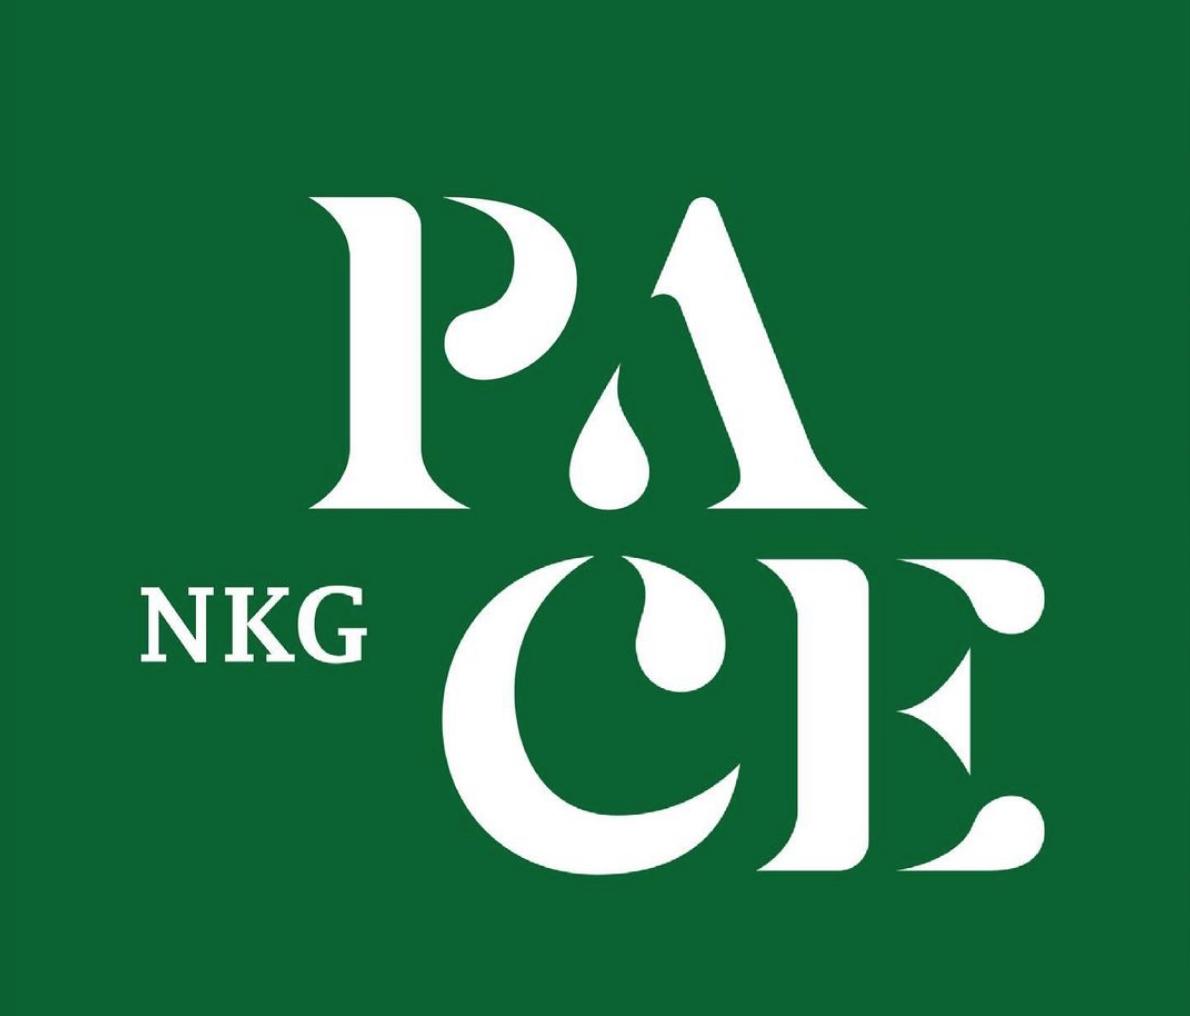 Logotipo de NKG PACE